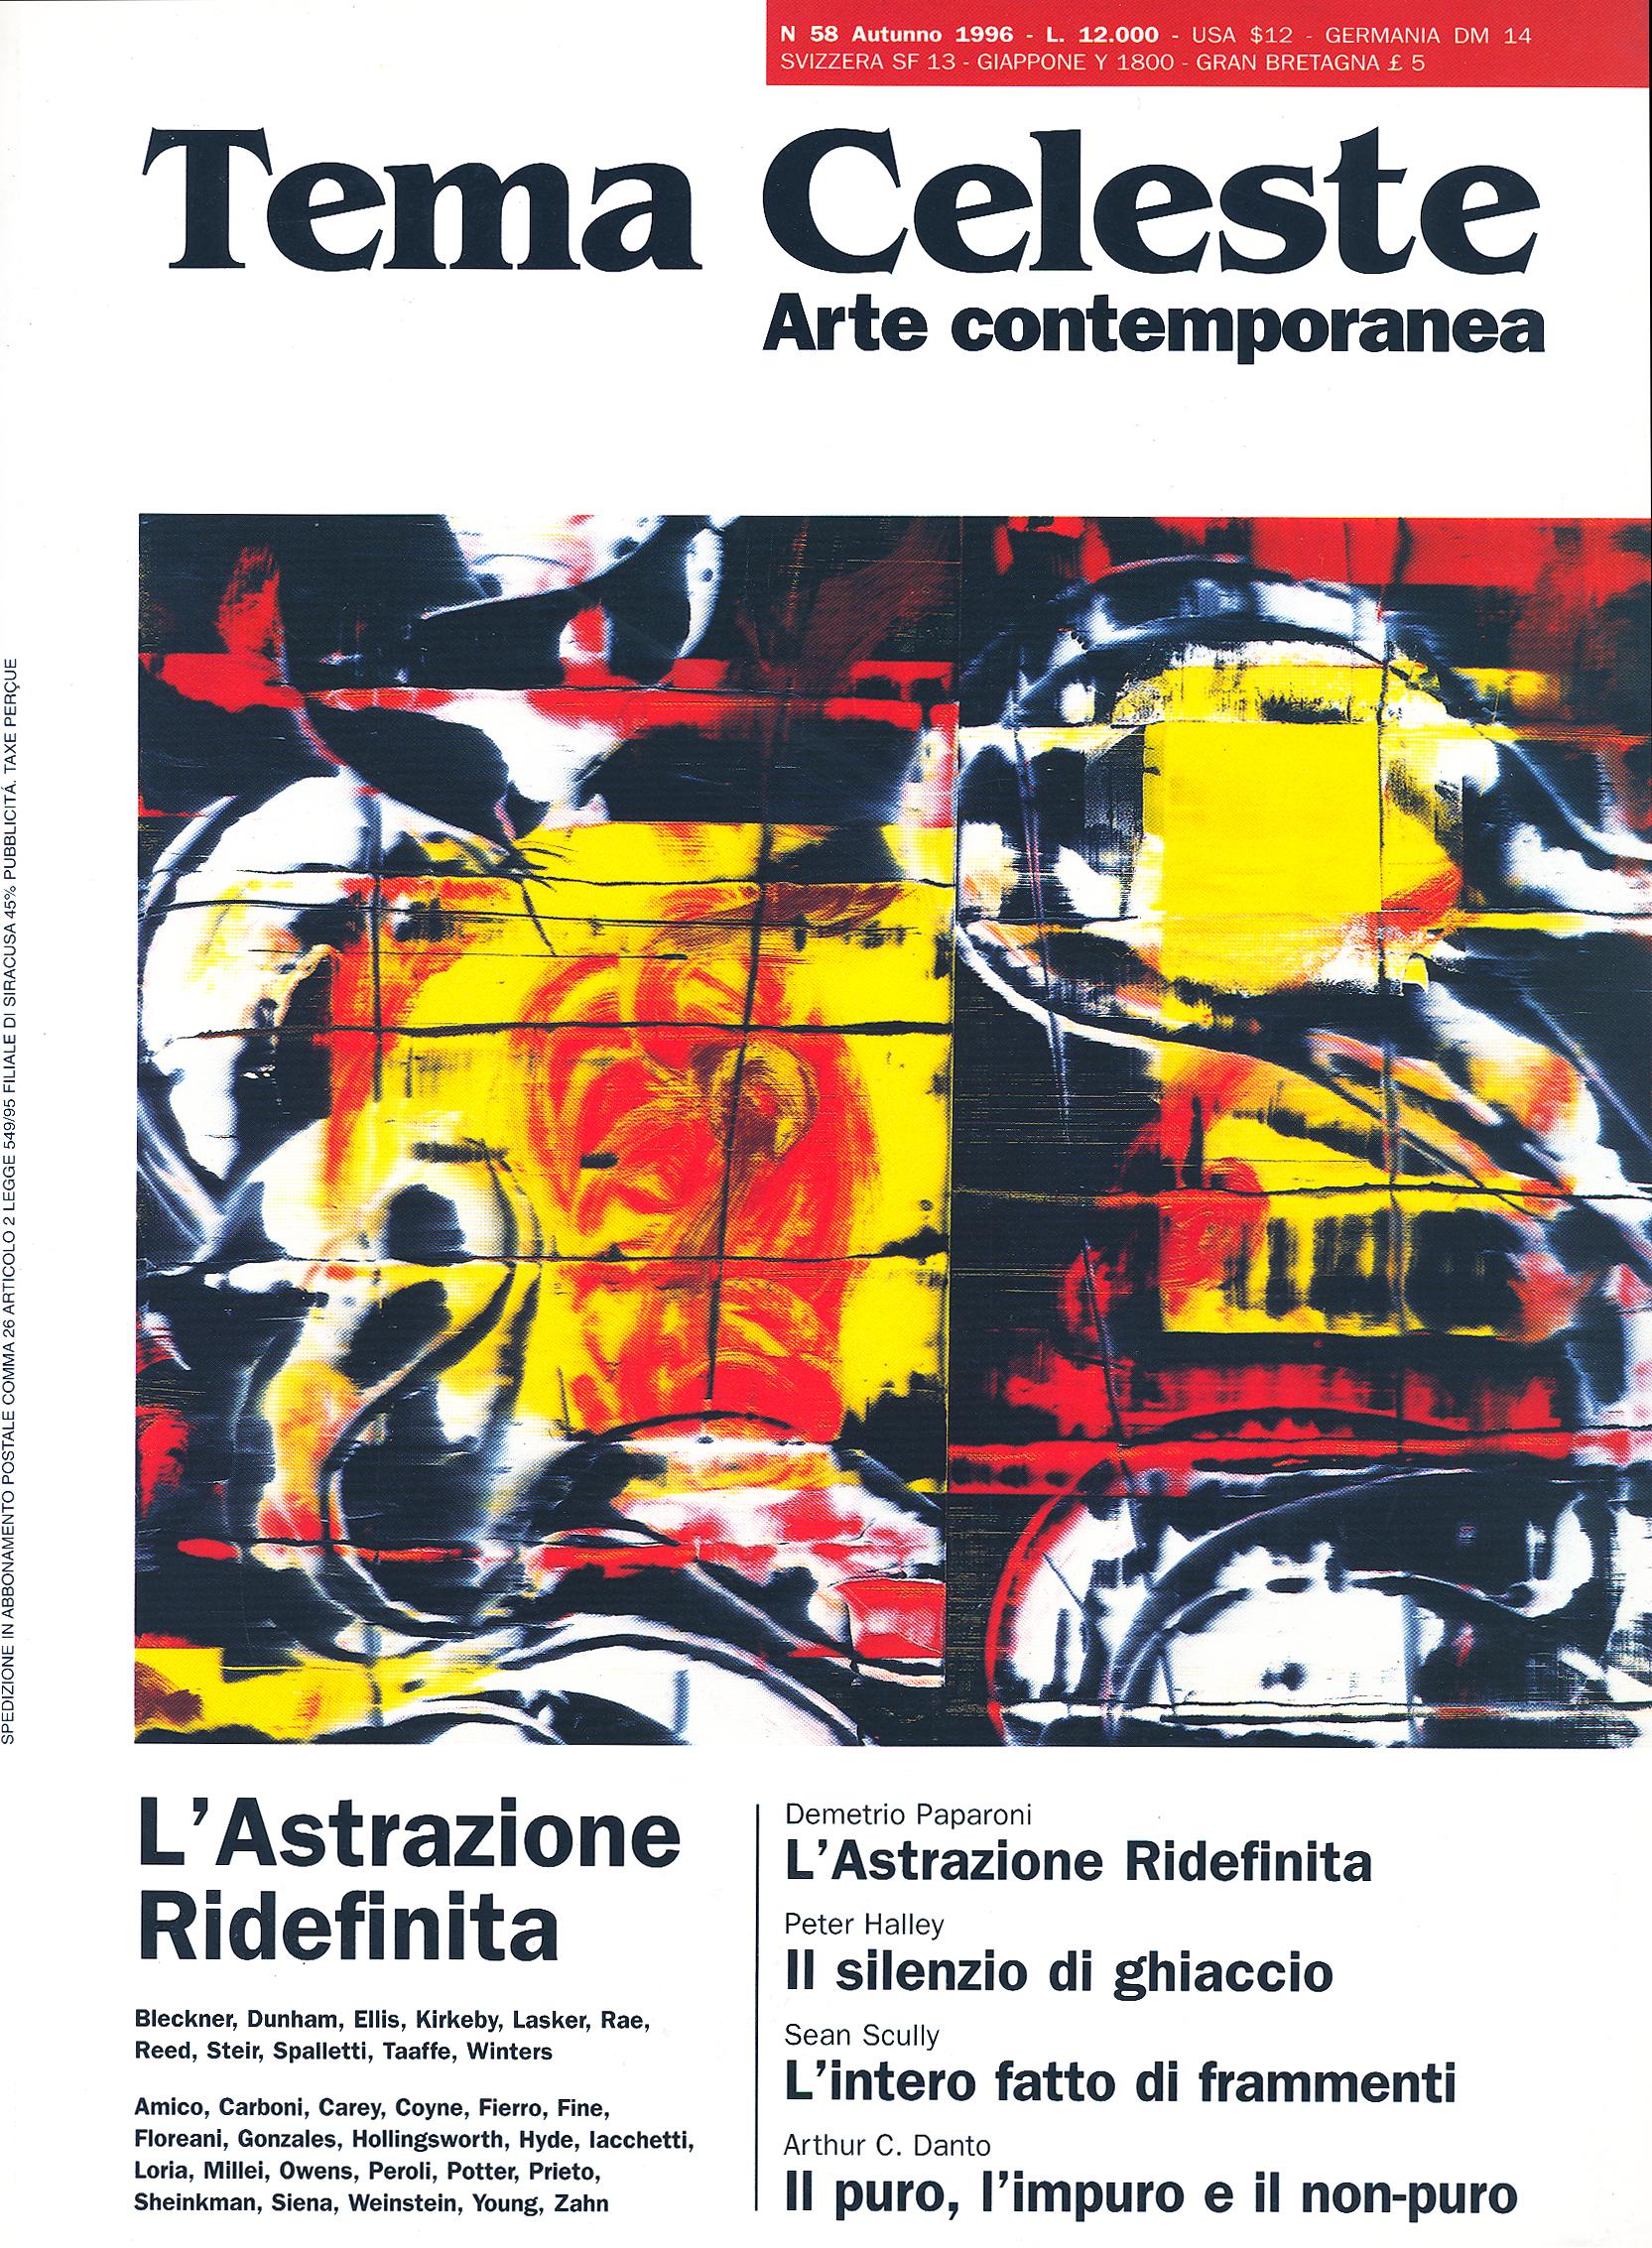 96 Tema Celeste-cover.jpg